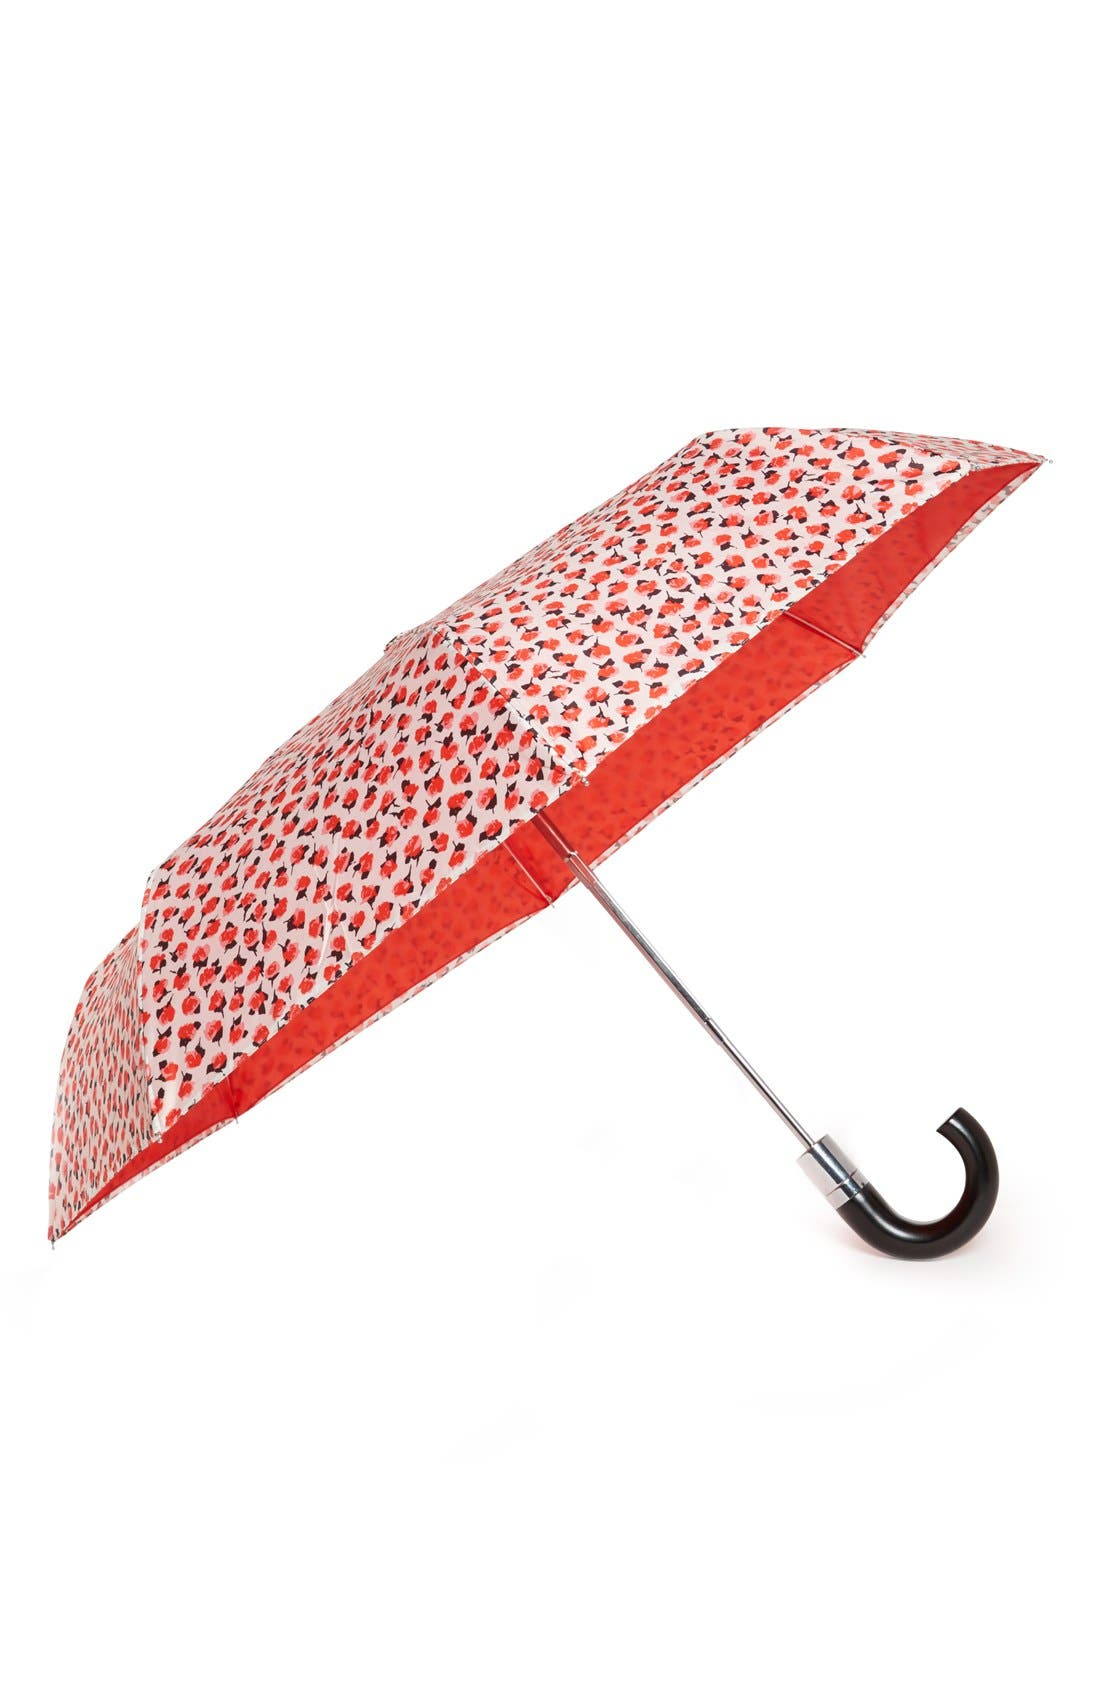 Main Image - kate spade new york 'roses' travel umbrella